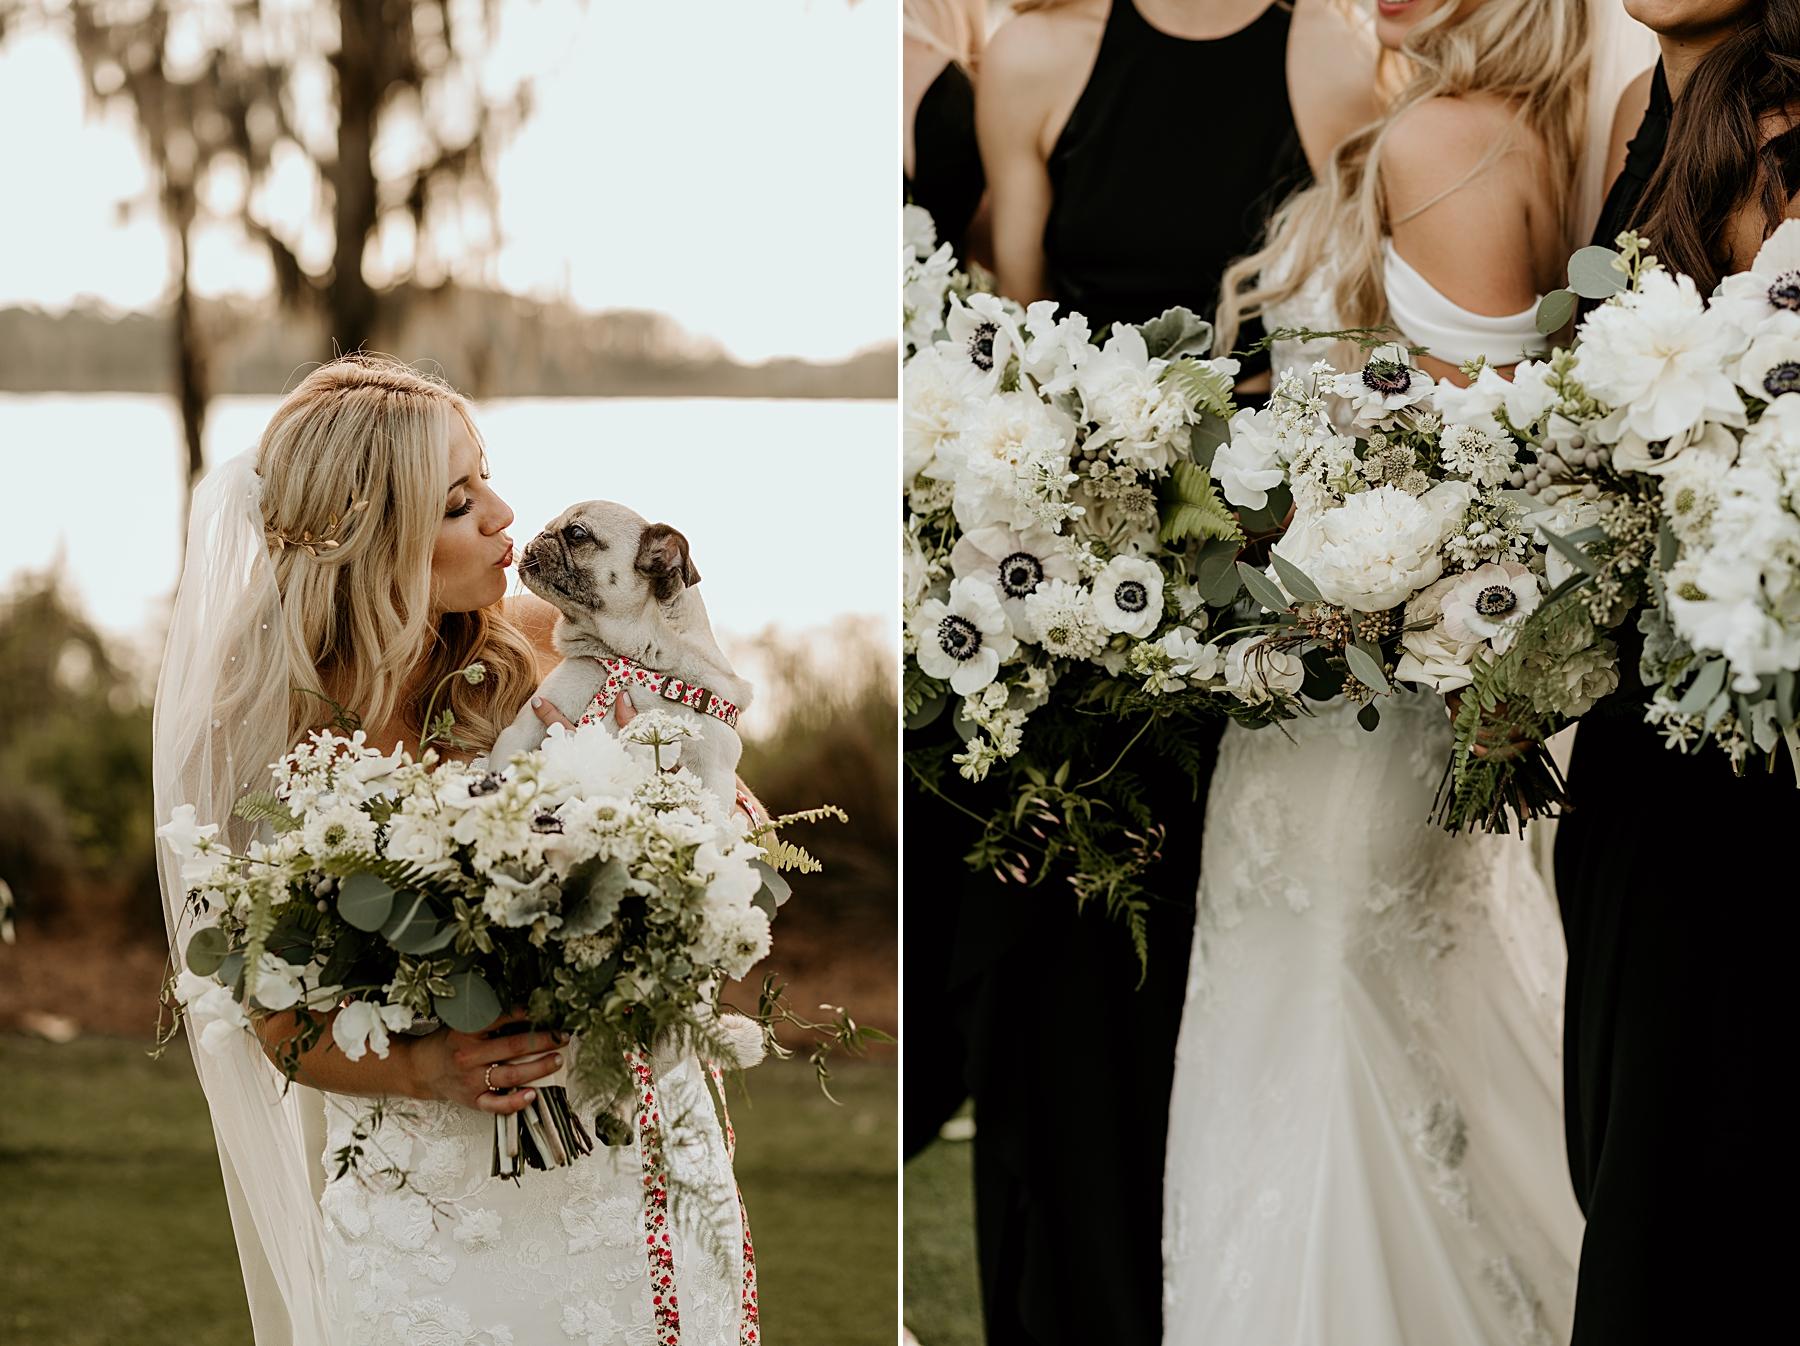 isleworth-wedding-35.jpg